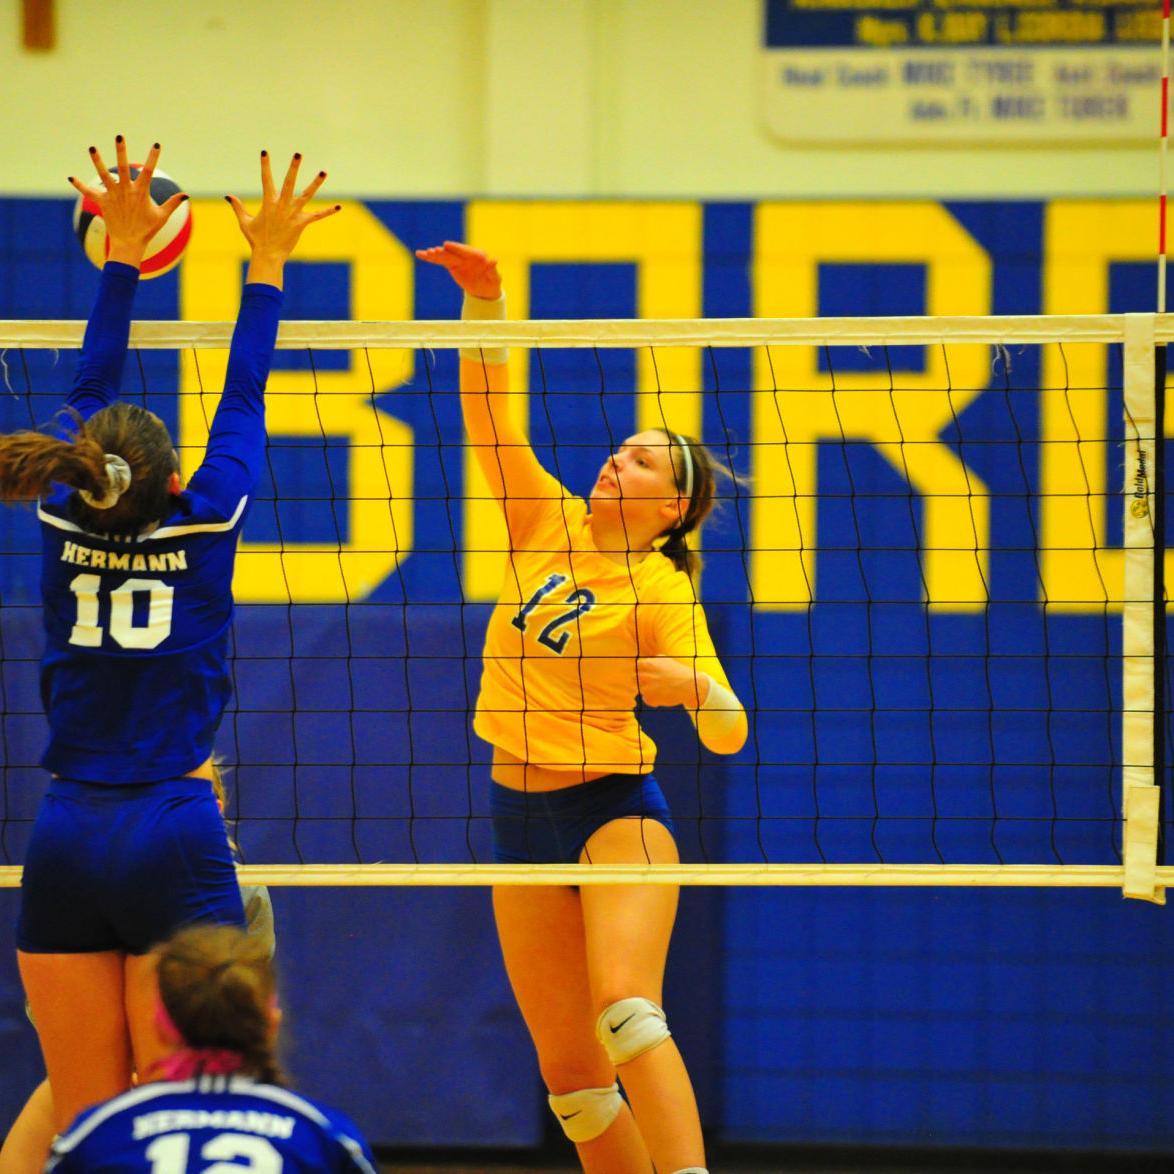 Volleyball — Hermann at Borgia